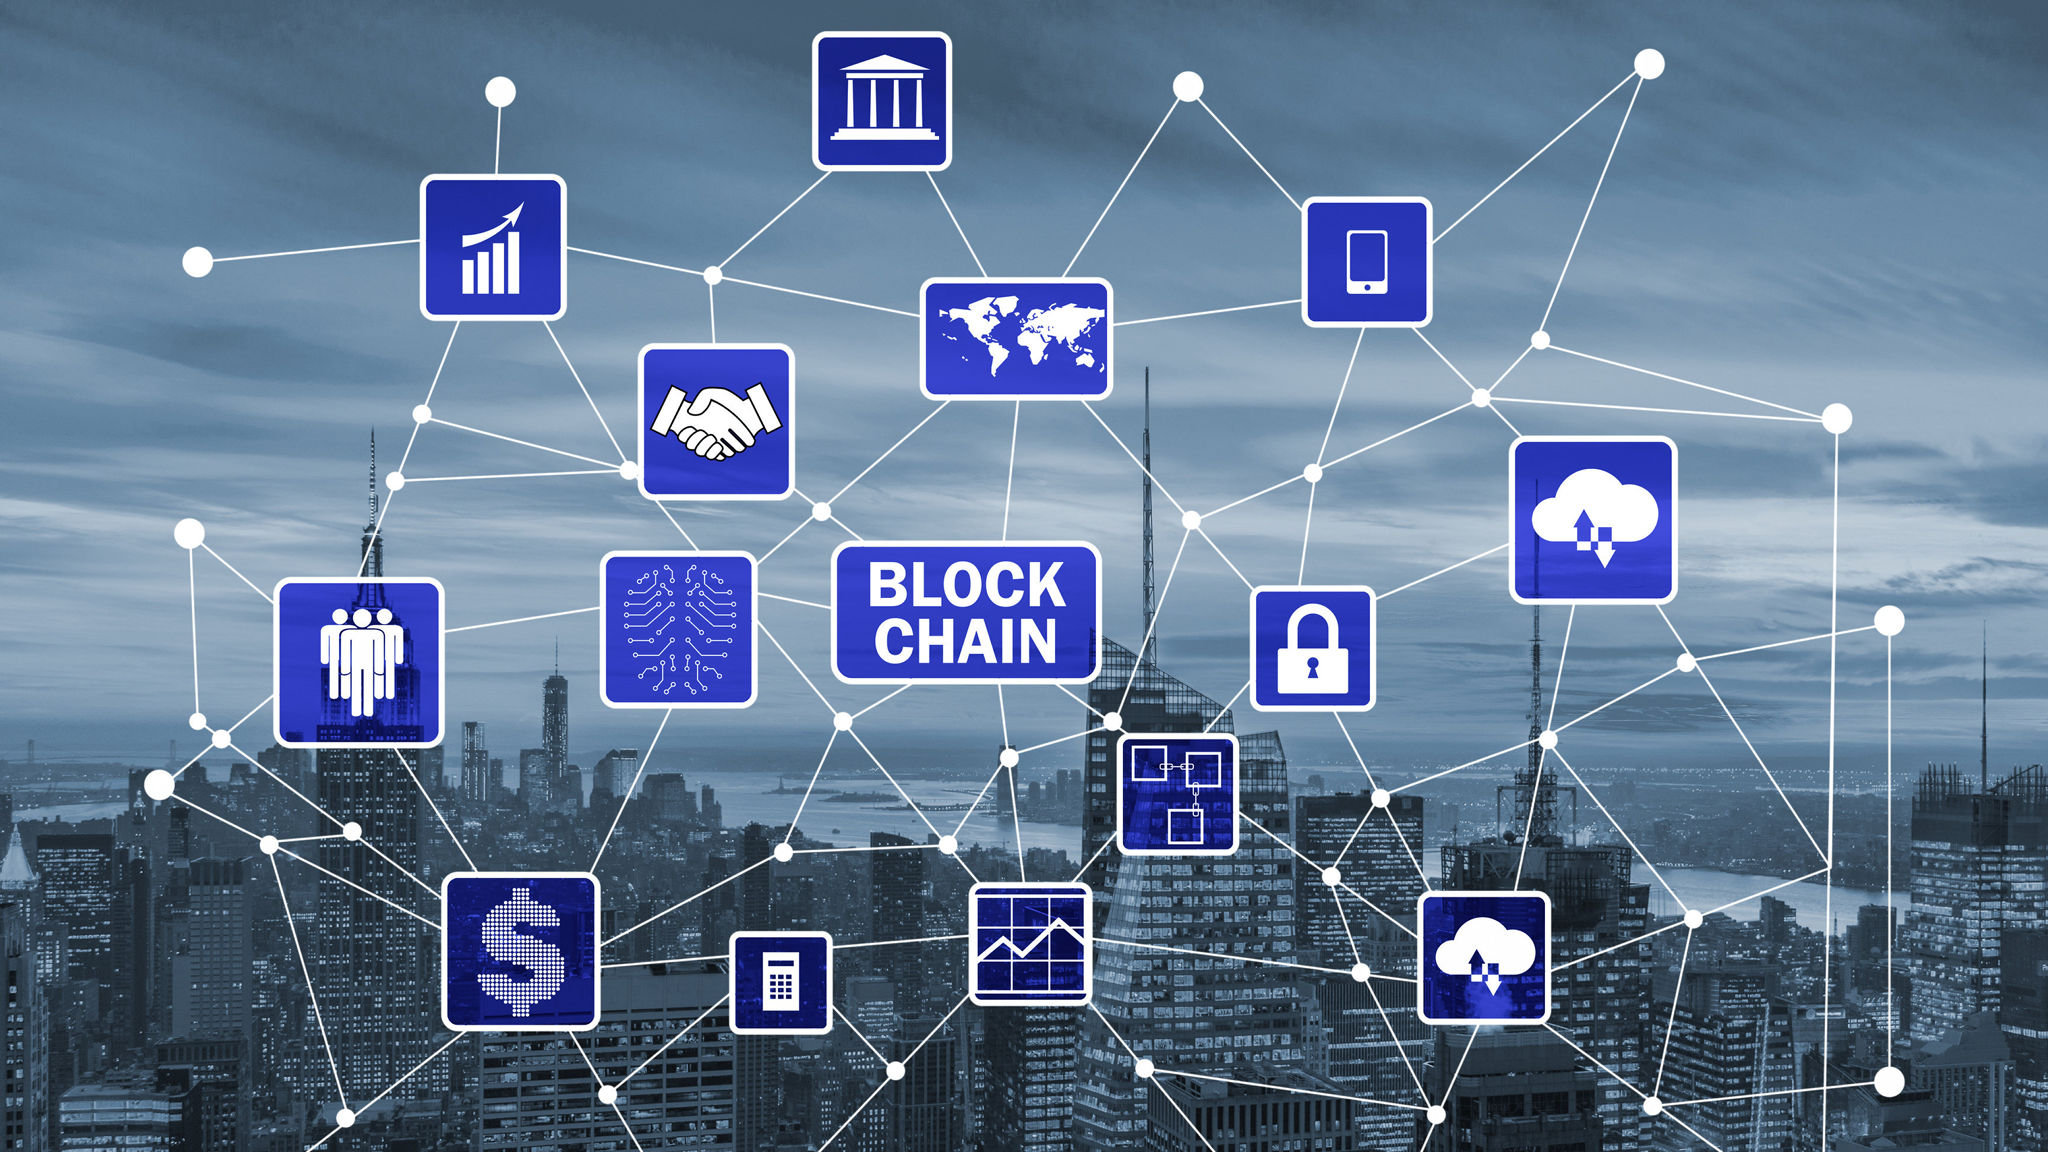 Blockchain: disillusionment descends on financial services